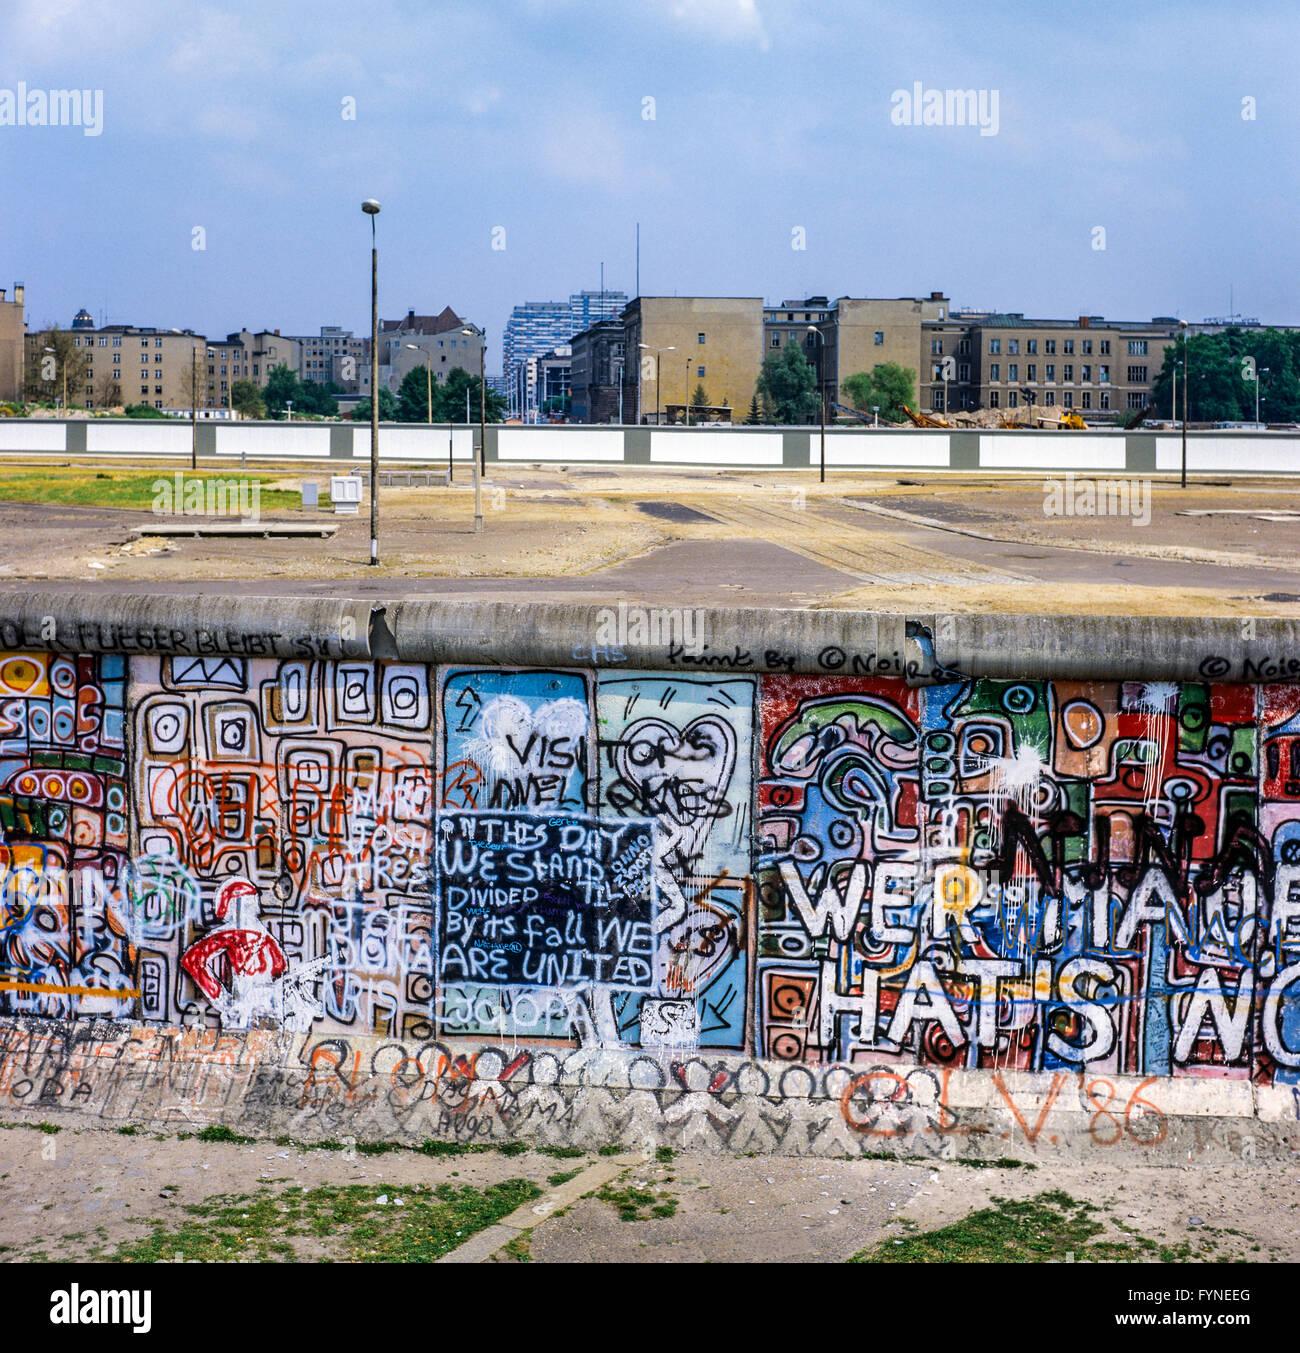 Agosto de 1986, el muro de Berlín graffitis en la plaza Potsdamer Platz con vistas Leipziger Platz, la franja Imagen De Stock